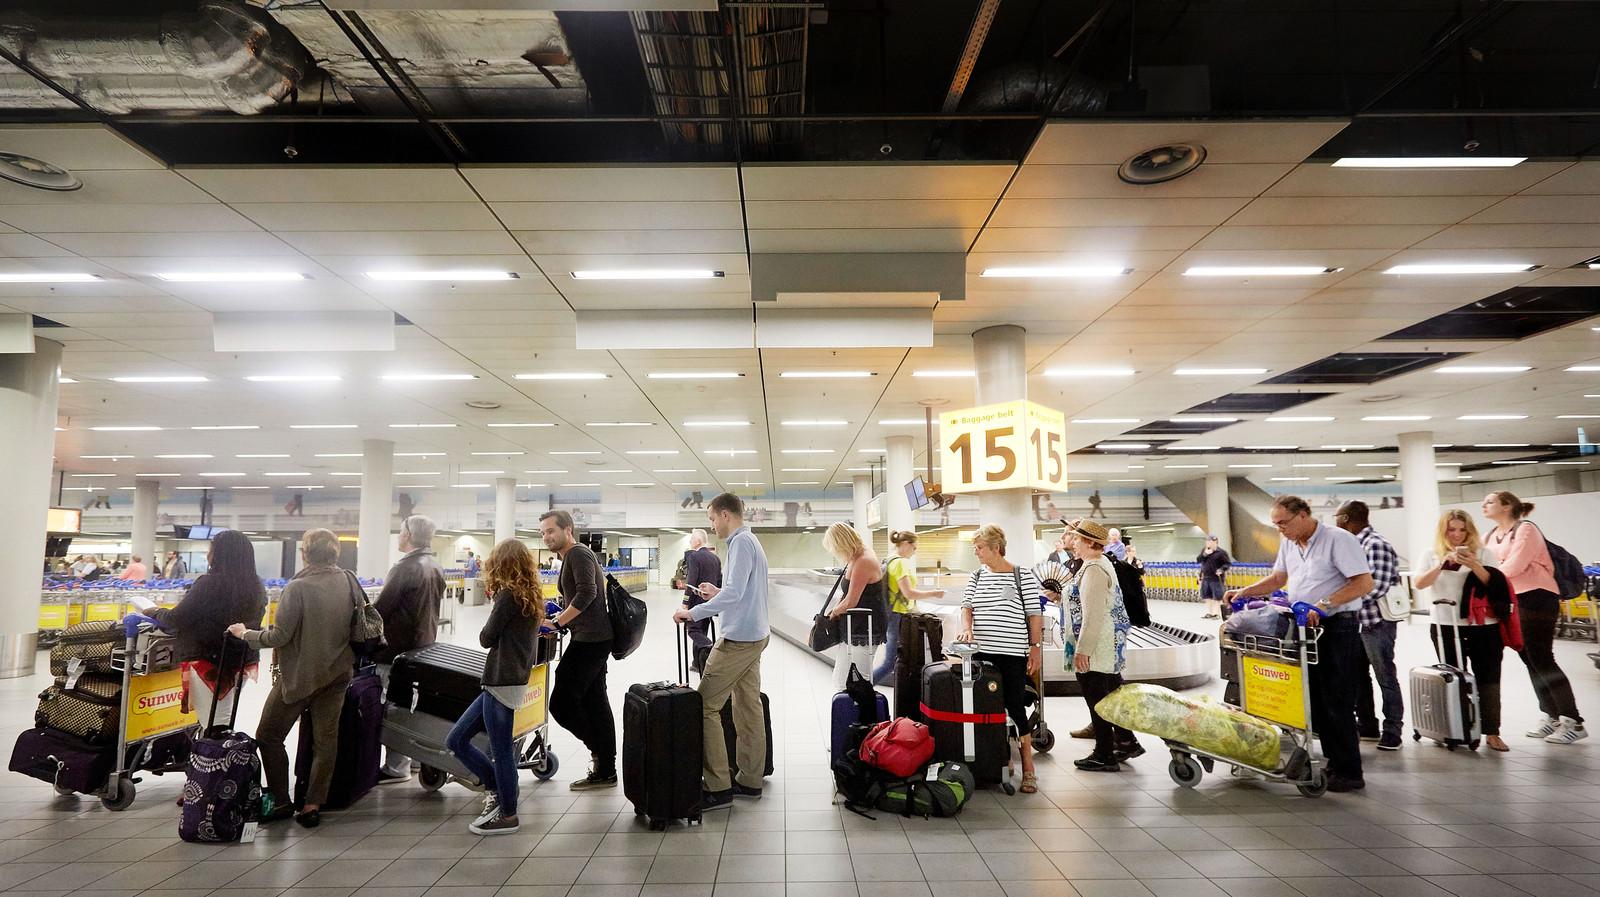 Reizigers op luchthaven Schiphol. Foto ter illustratie.